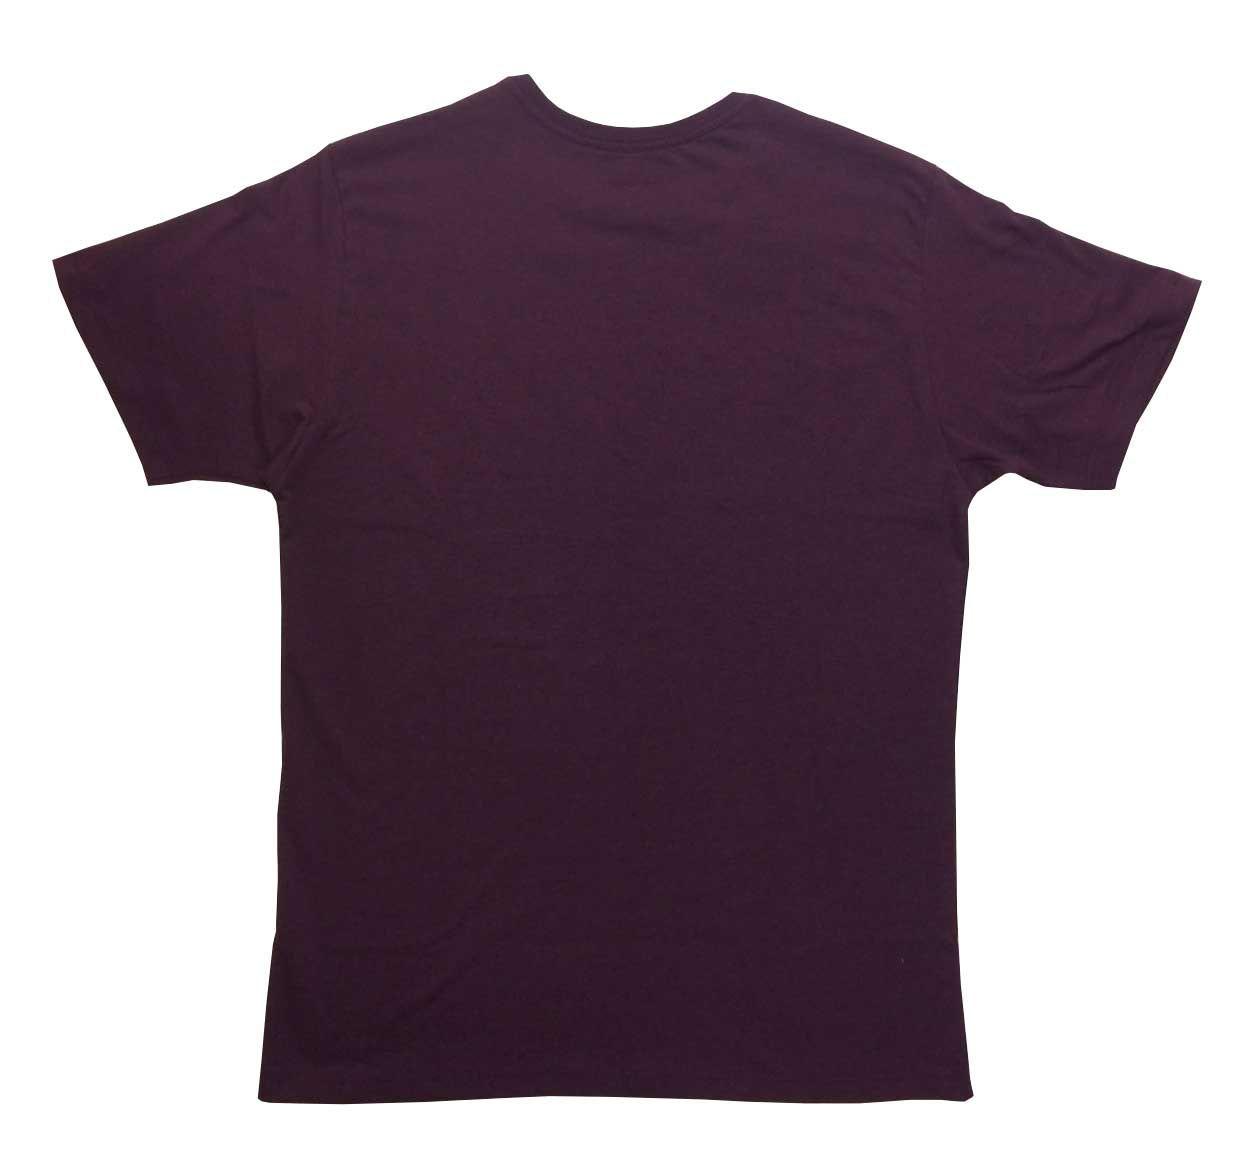 Camiseta Hurley 639005l137 Masculina Vinho